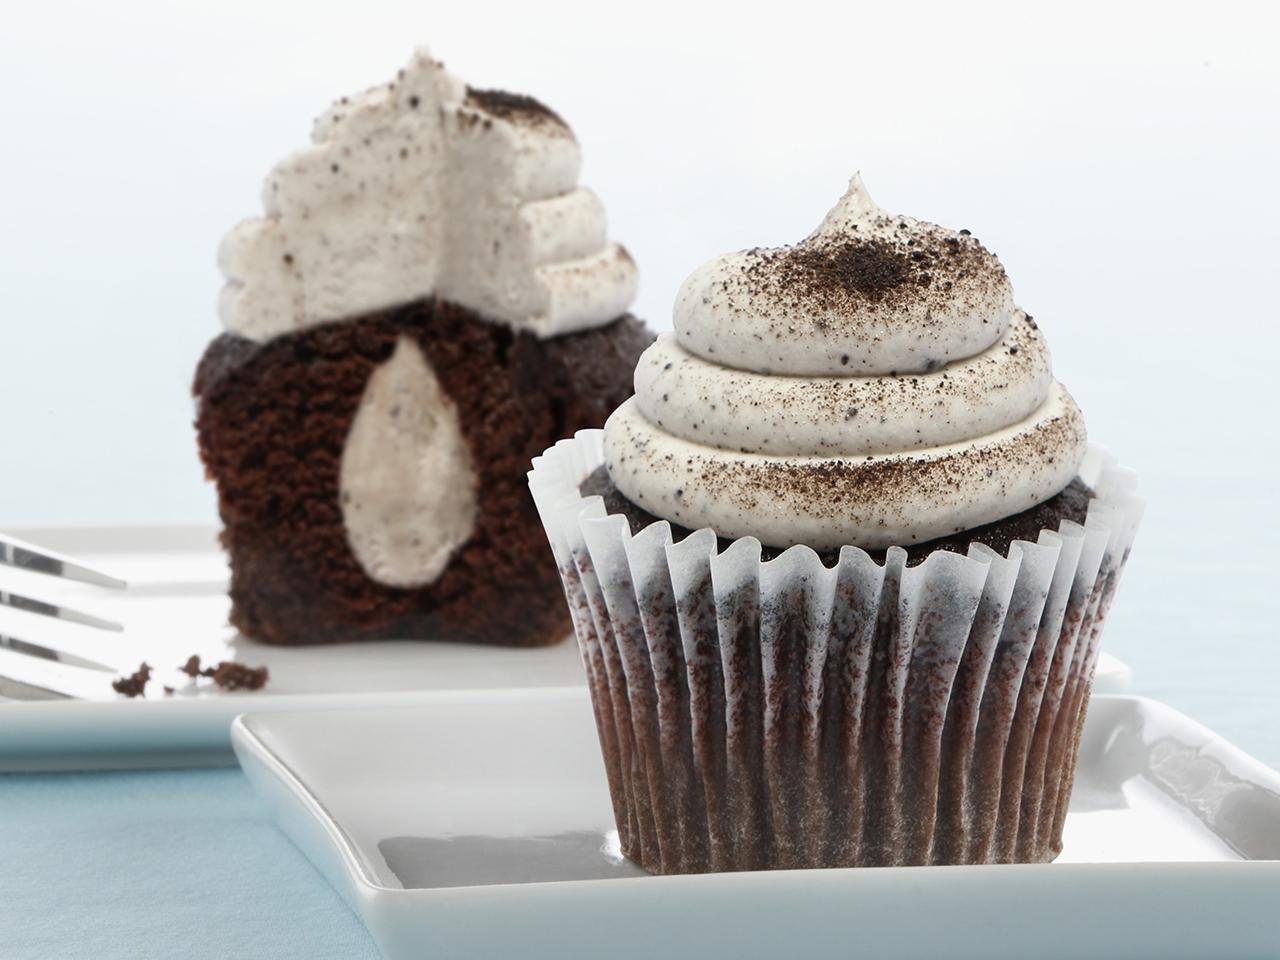 Gourmet Cupcakes Kimberley S Bakeshoppe